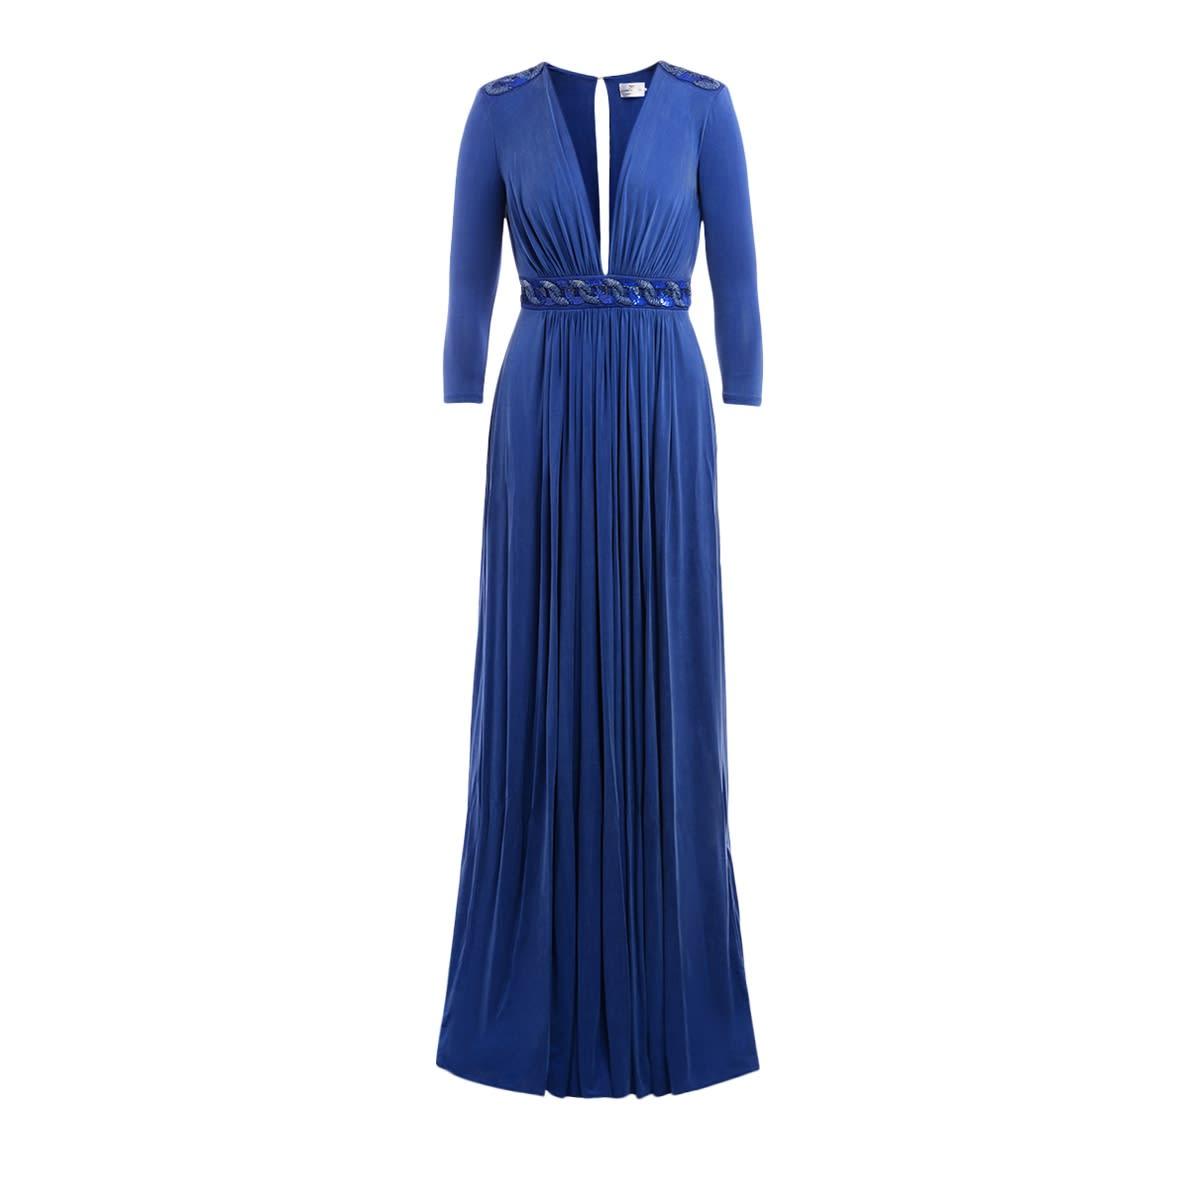 Buy Maxi Dress Elisabetta Franchi Cobalt Blue Color online, shop Elisabetta Franchi Celyn B. with free shipping